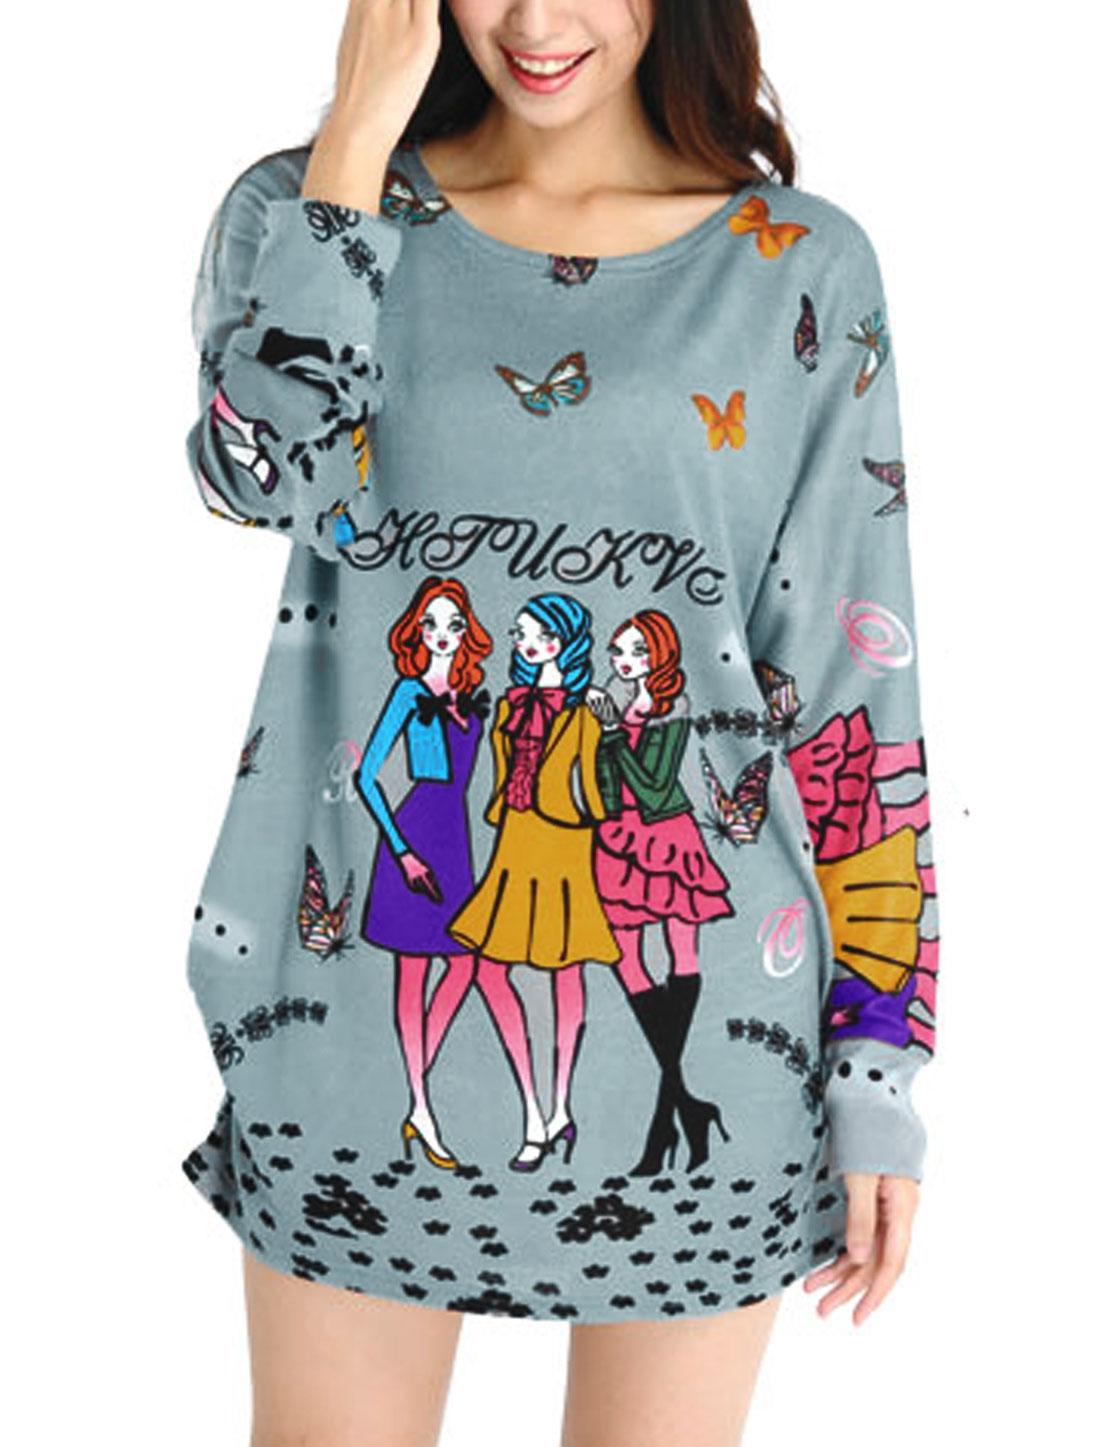 Lady Butterfly Letters Cartoon Pattern Shirred Side Leisure Tunic Knit Shirt Light Gray L